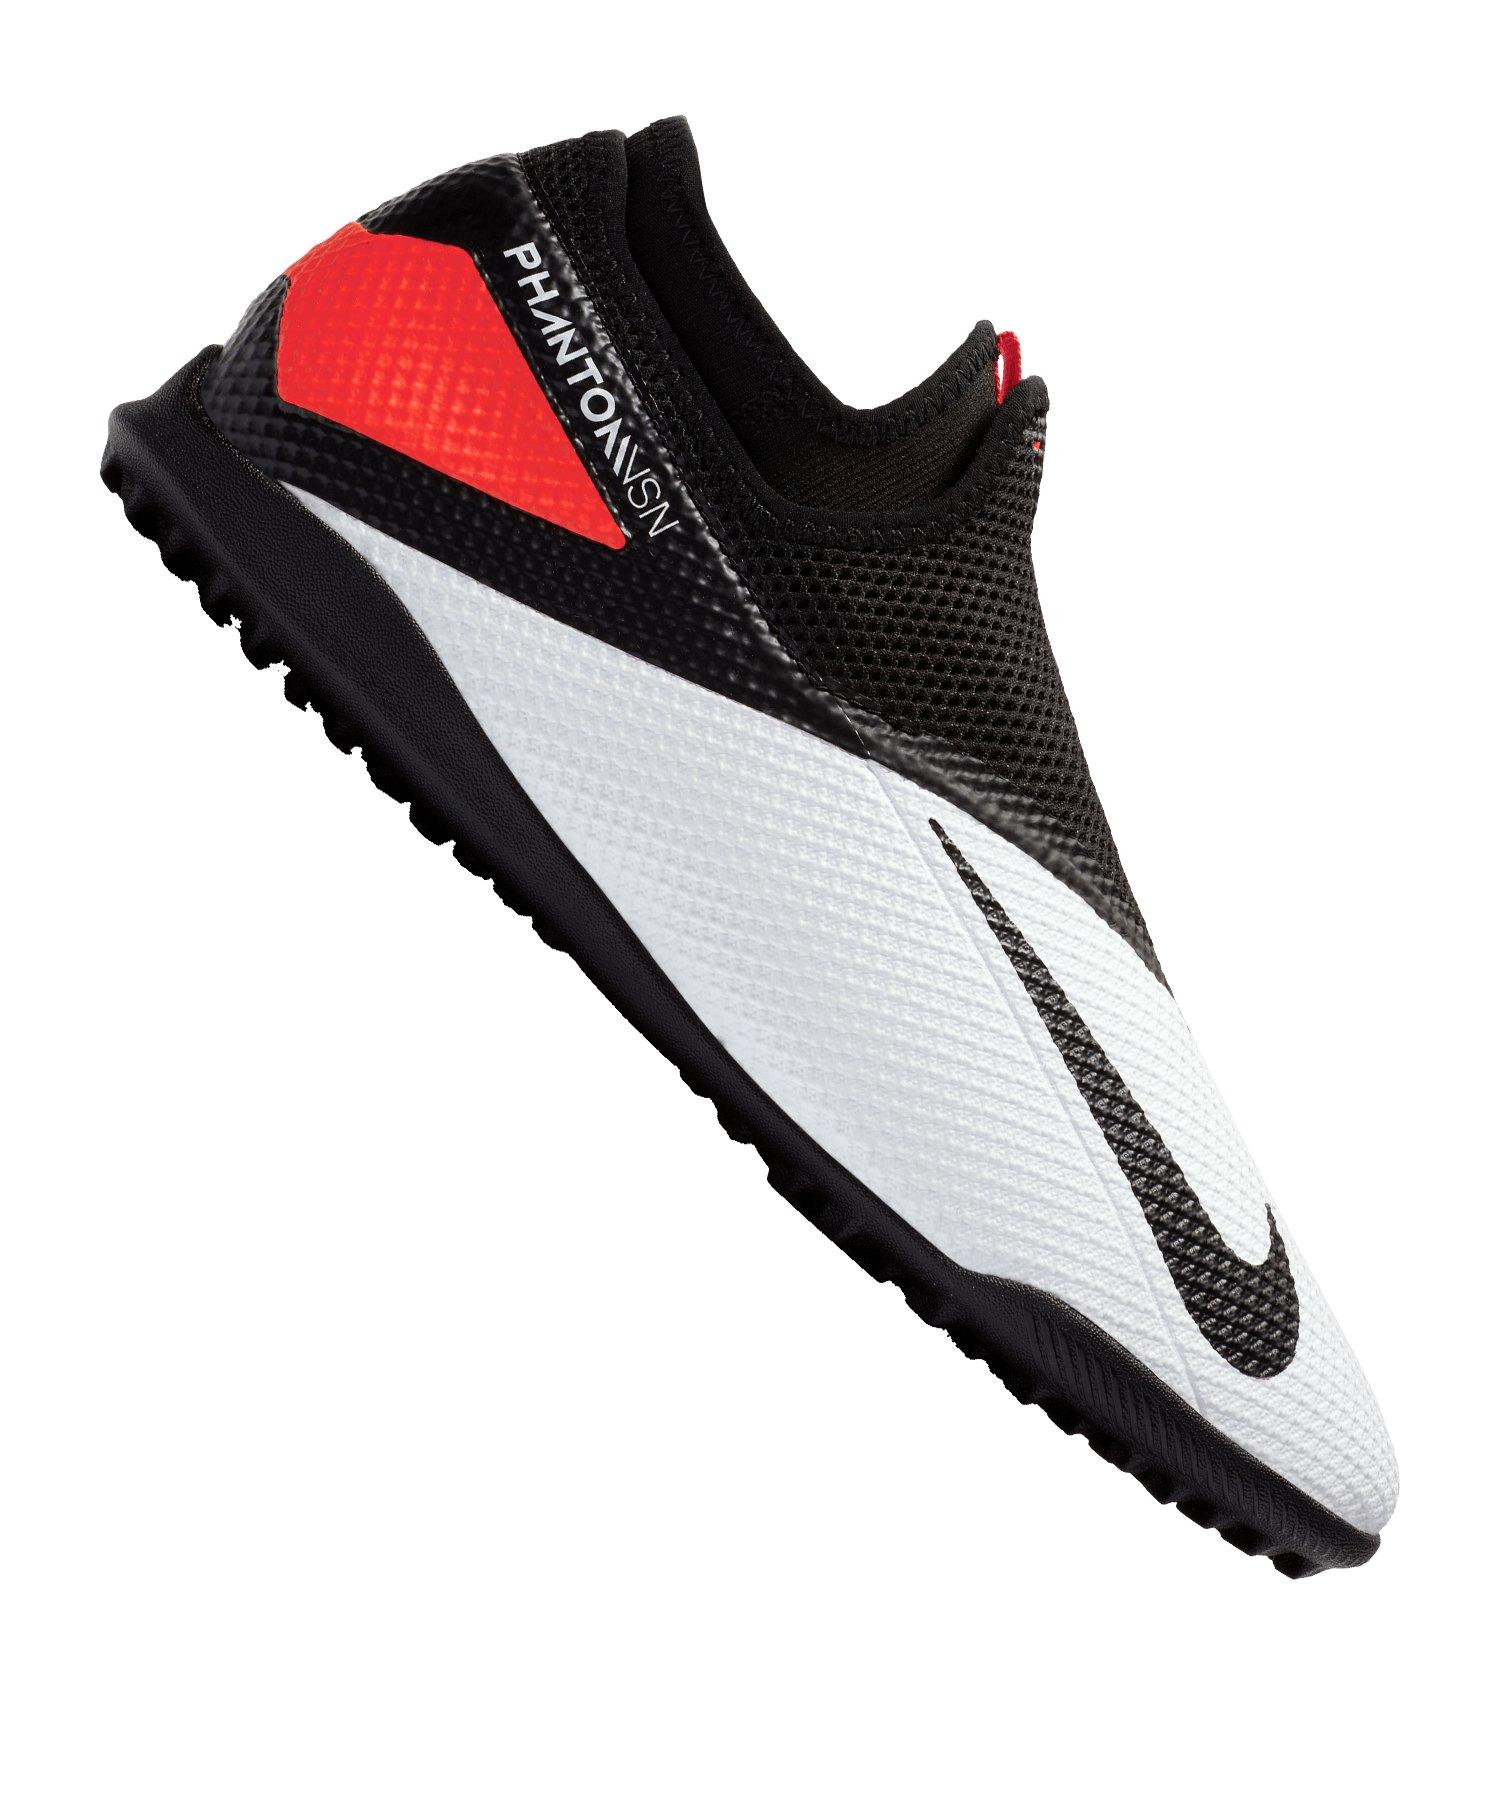 Nike Phantom Vision II Academy DF TF Weiss F106 - weiss